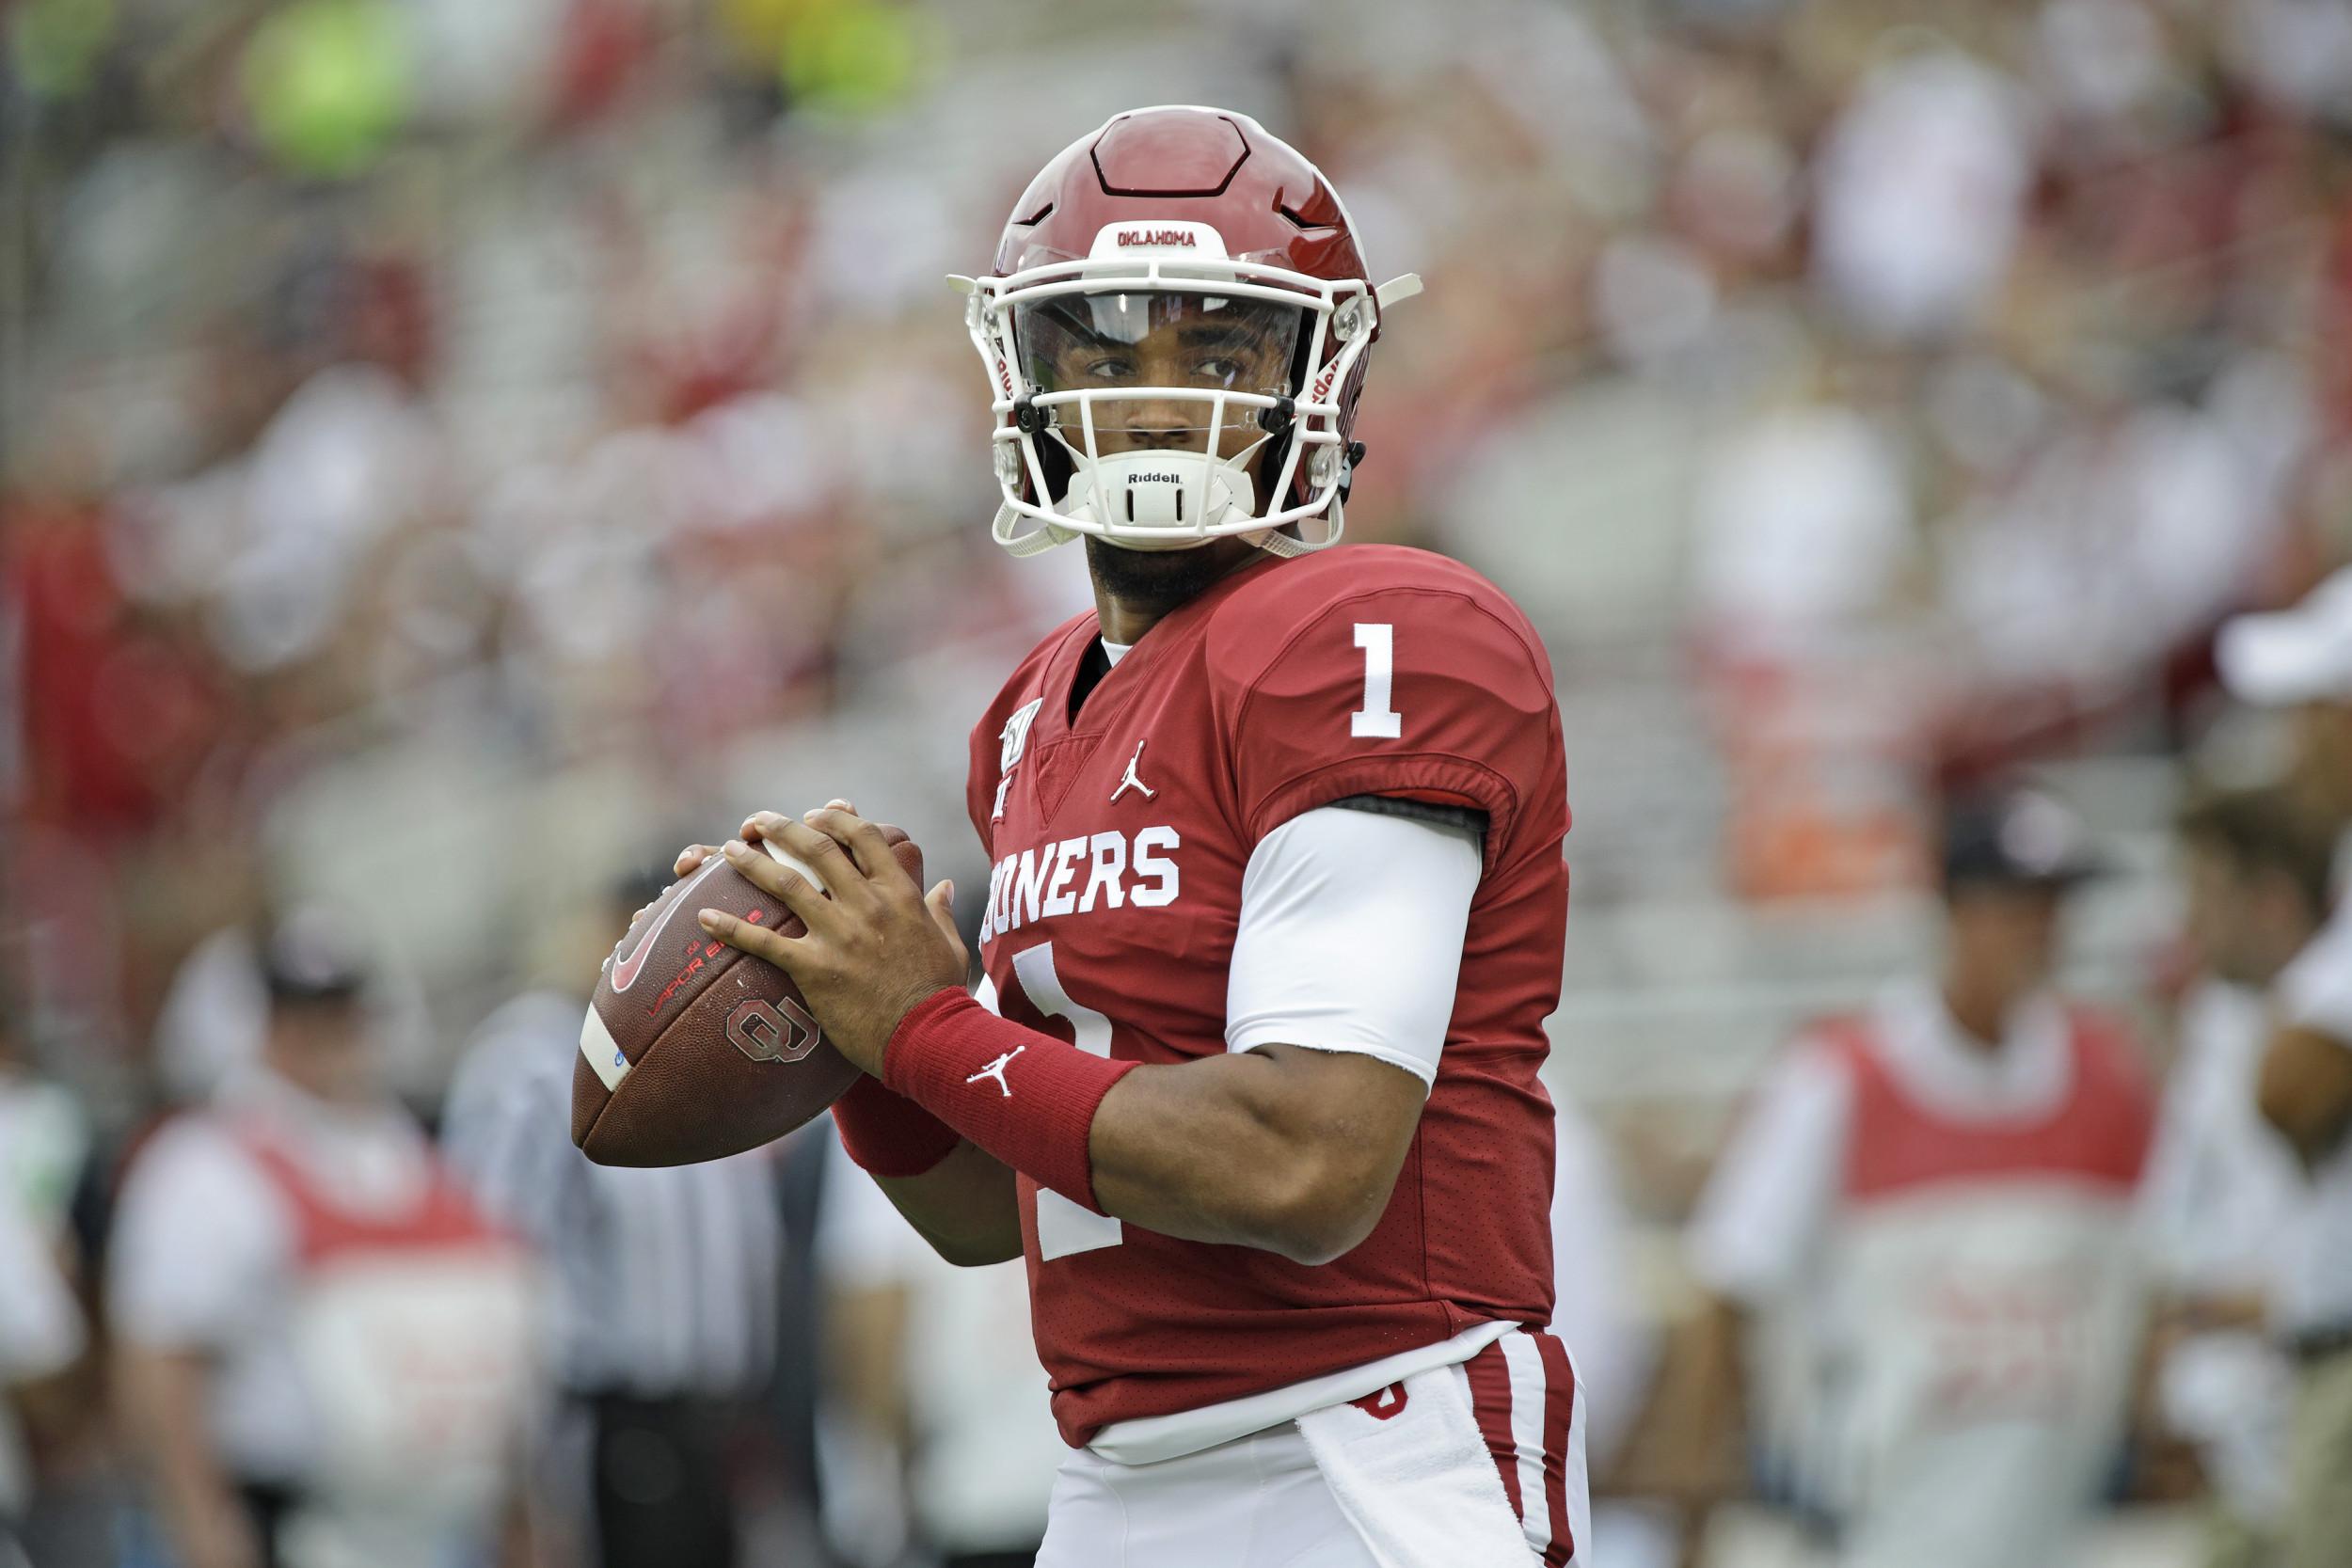 College Football 2019 Where To Watch Oklahoma Vs Texas Tv